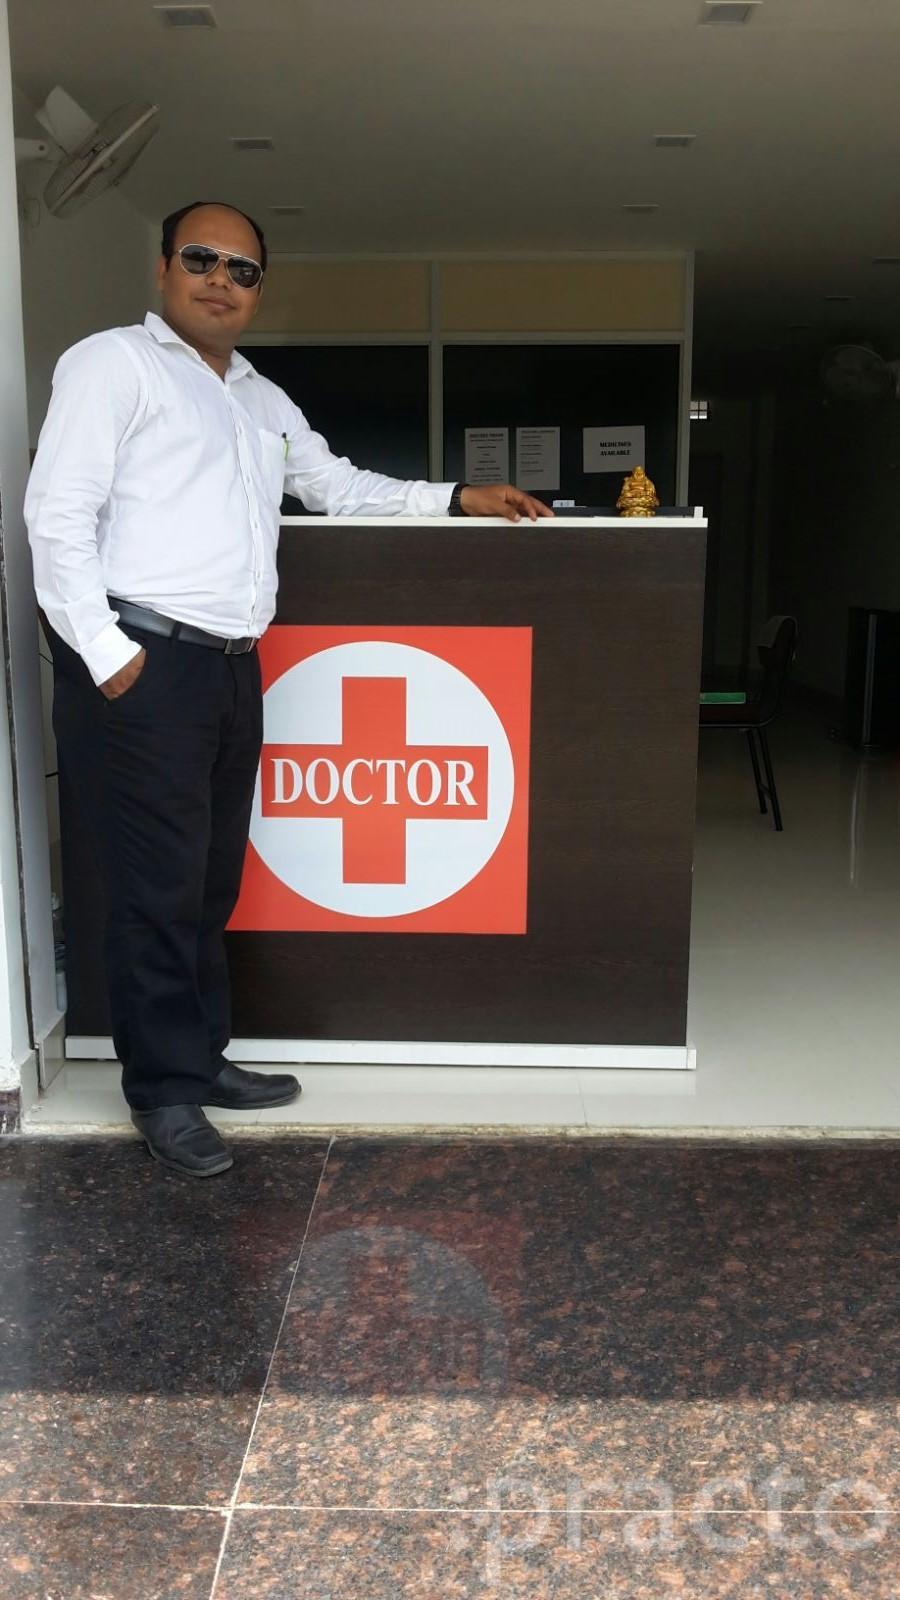 Dr. Imtiaz Kabirudin Bandeali - Ear-Nose-Throat (ENT) Specialist